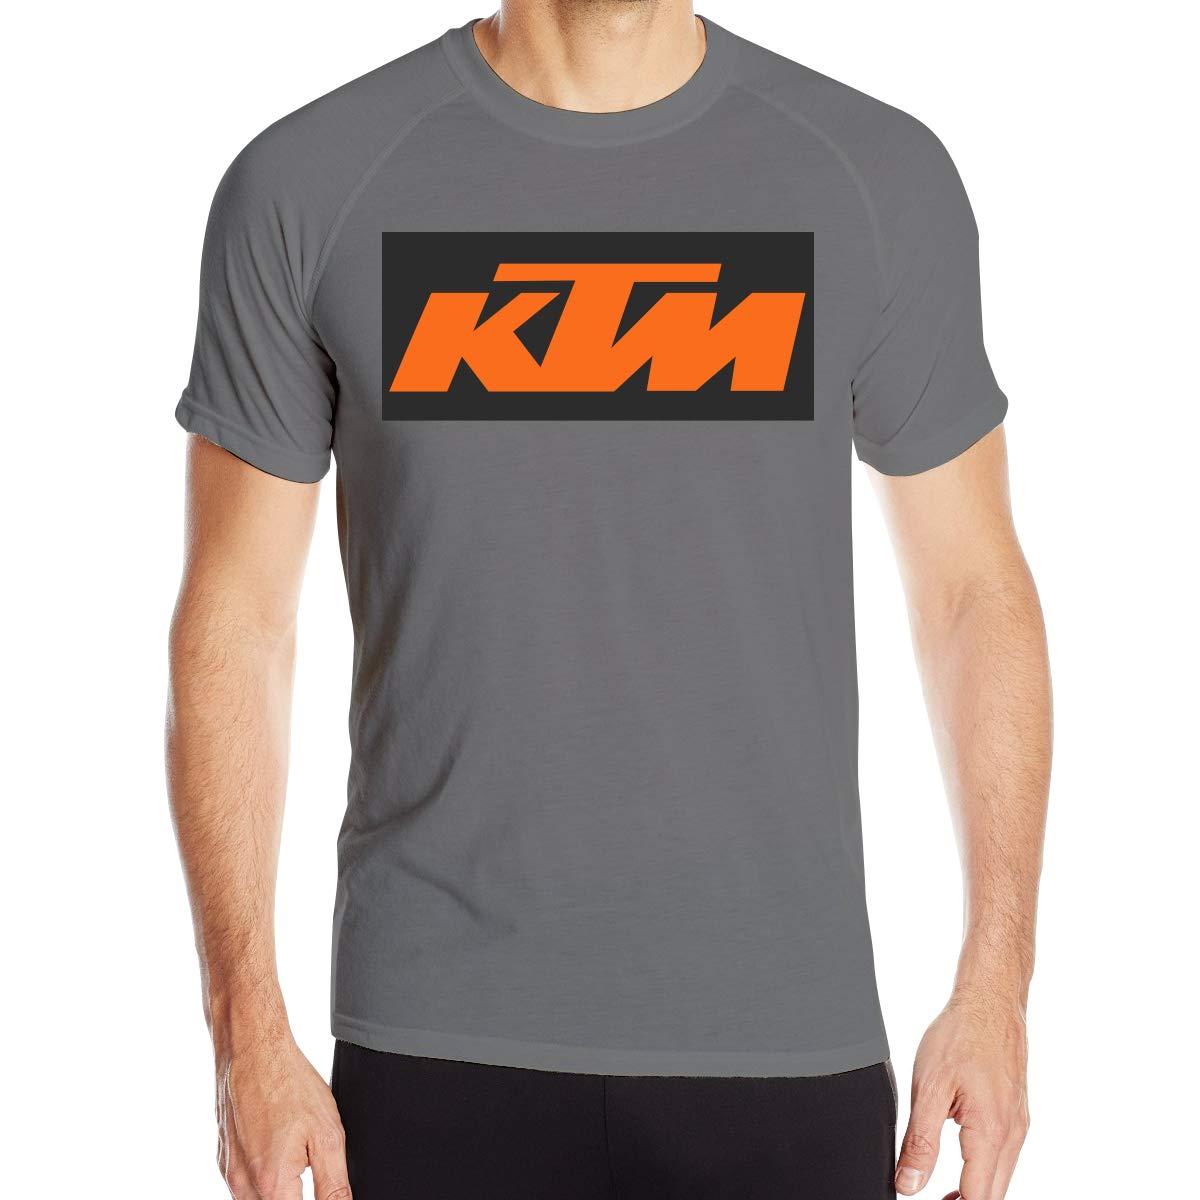 BOSIJCAI Personalized Quick Drying КТМ Logo Breathable T Shirt for Men O-Neck Black